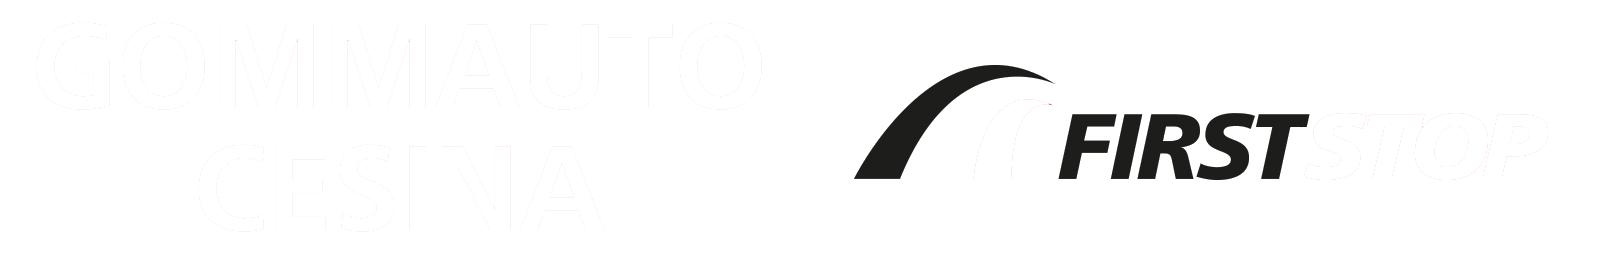 gommauto-cesina